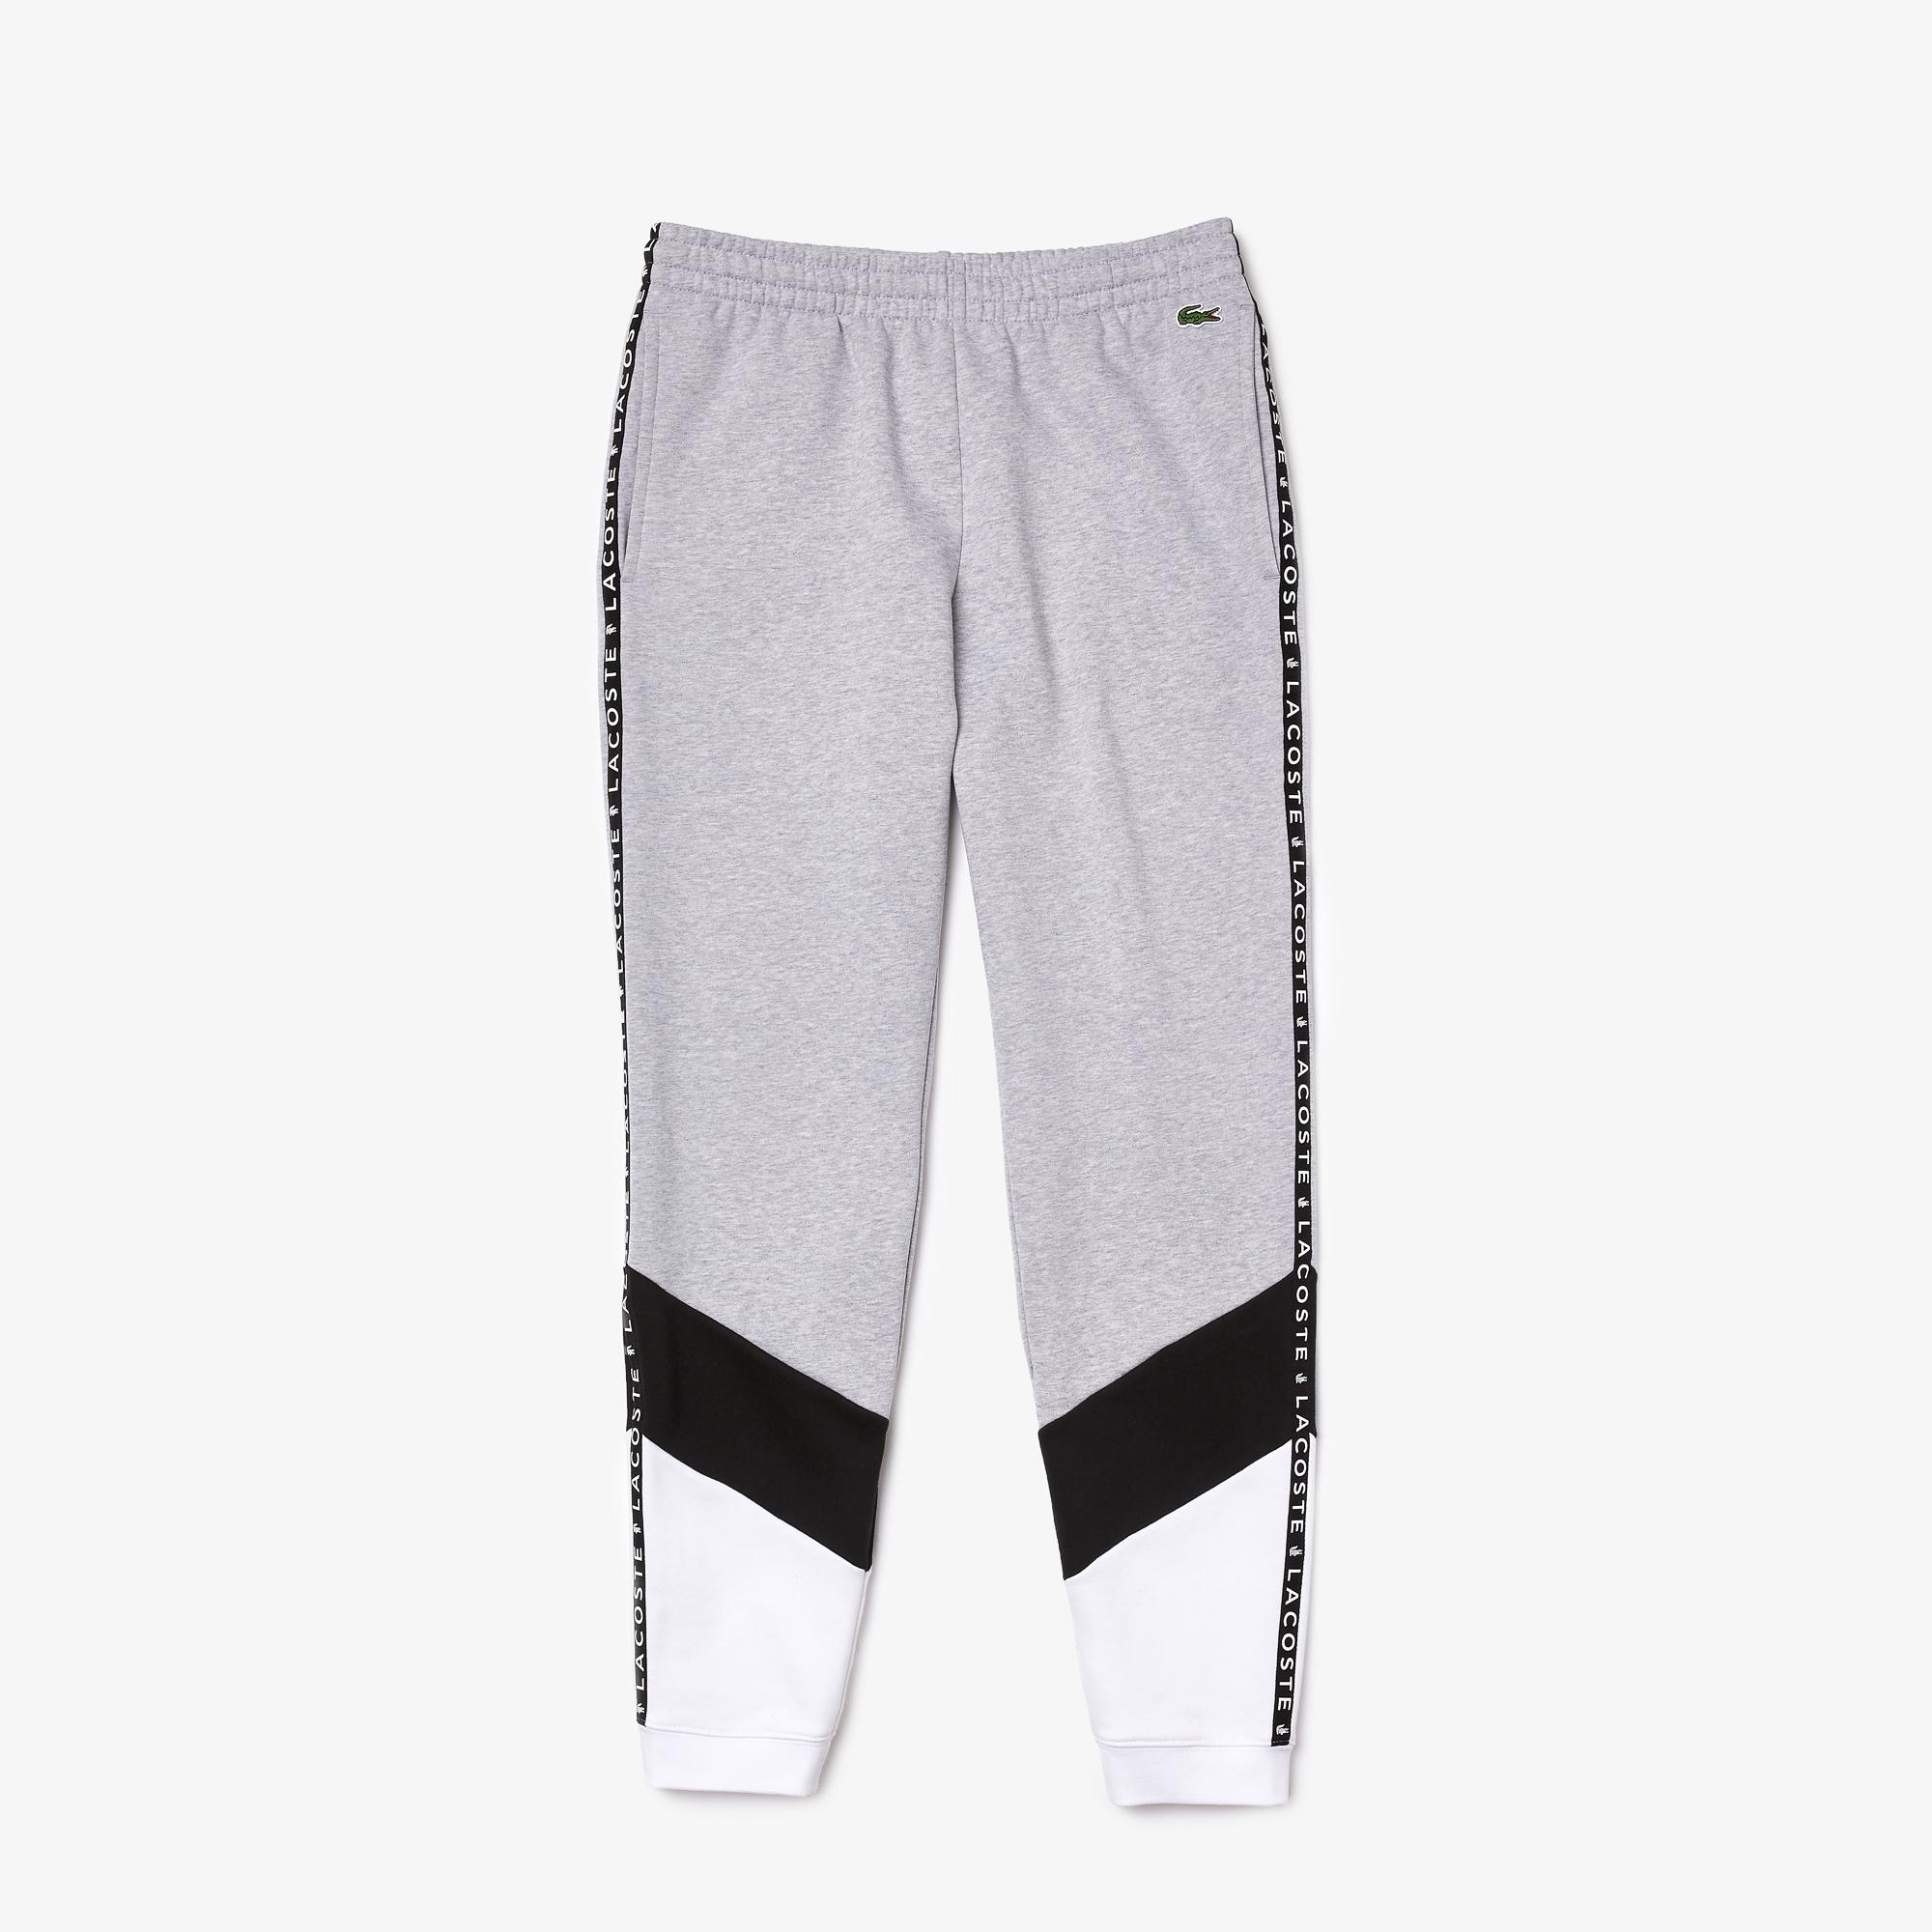 Lacoste Sweatpants, Grey Chine/Black/White, M